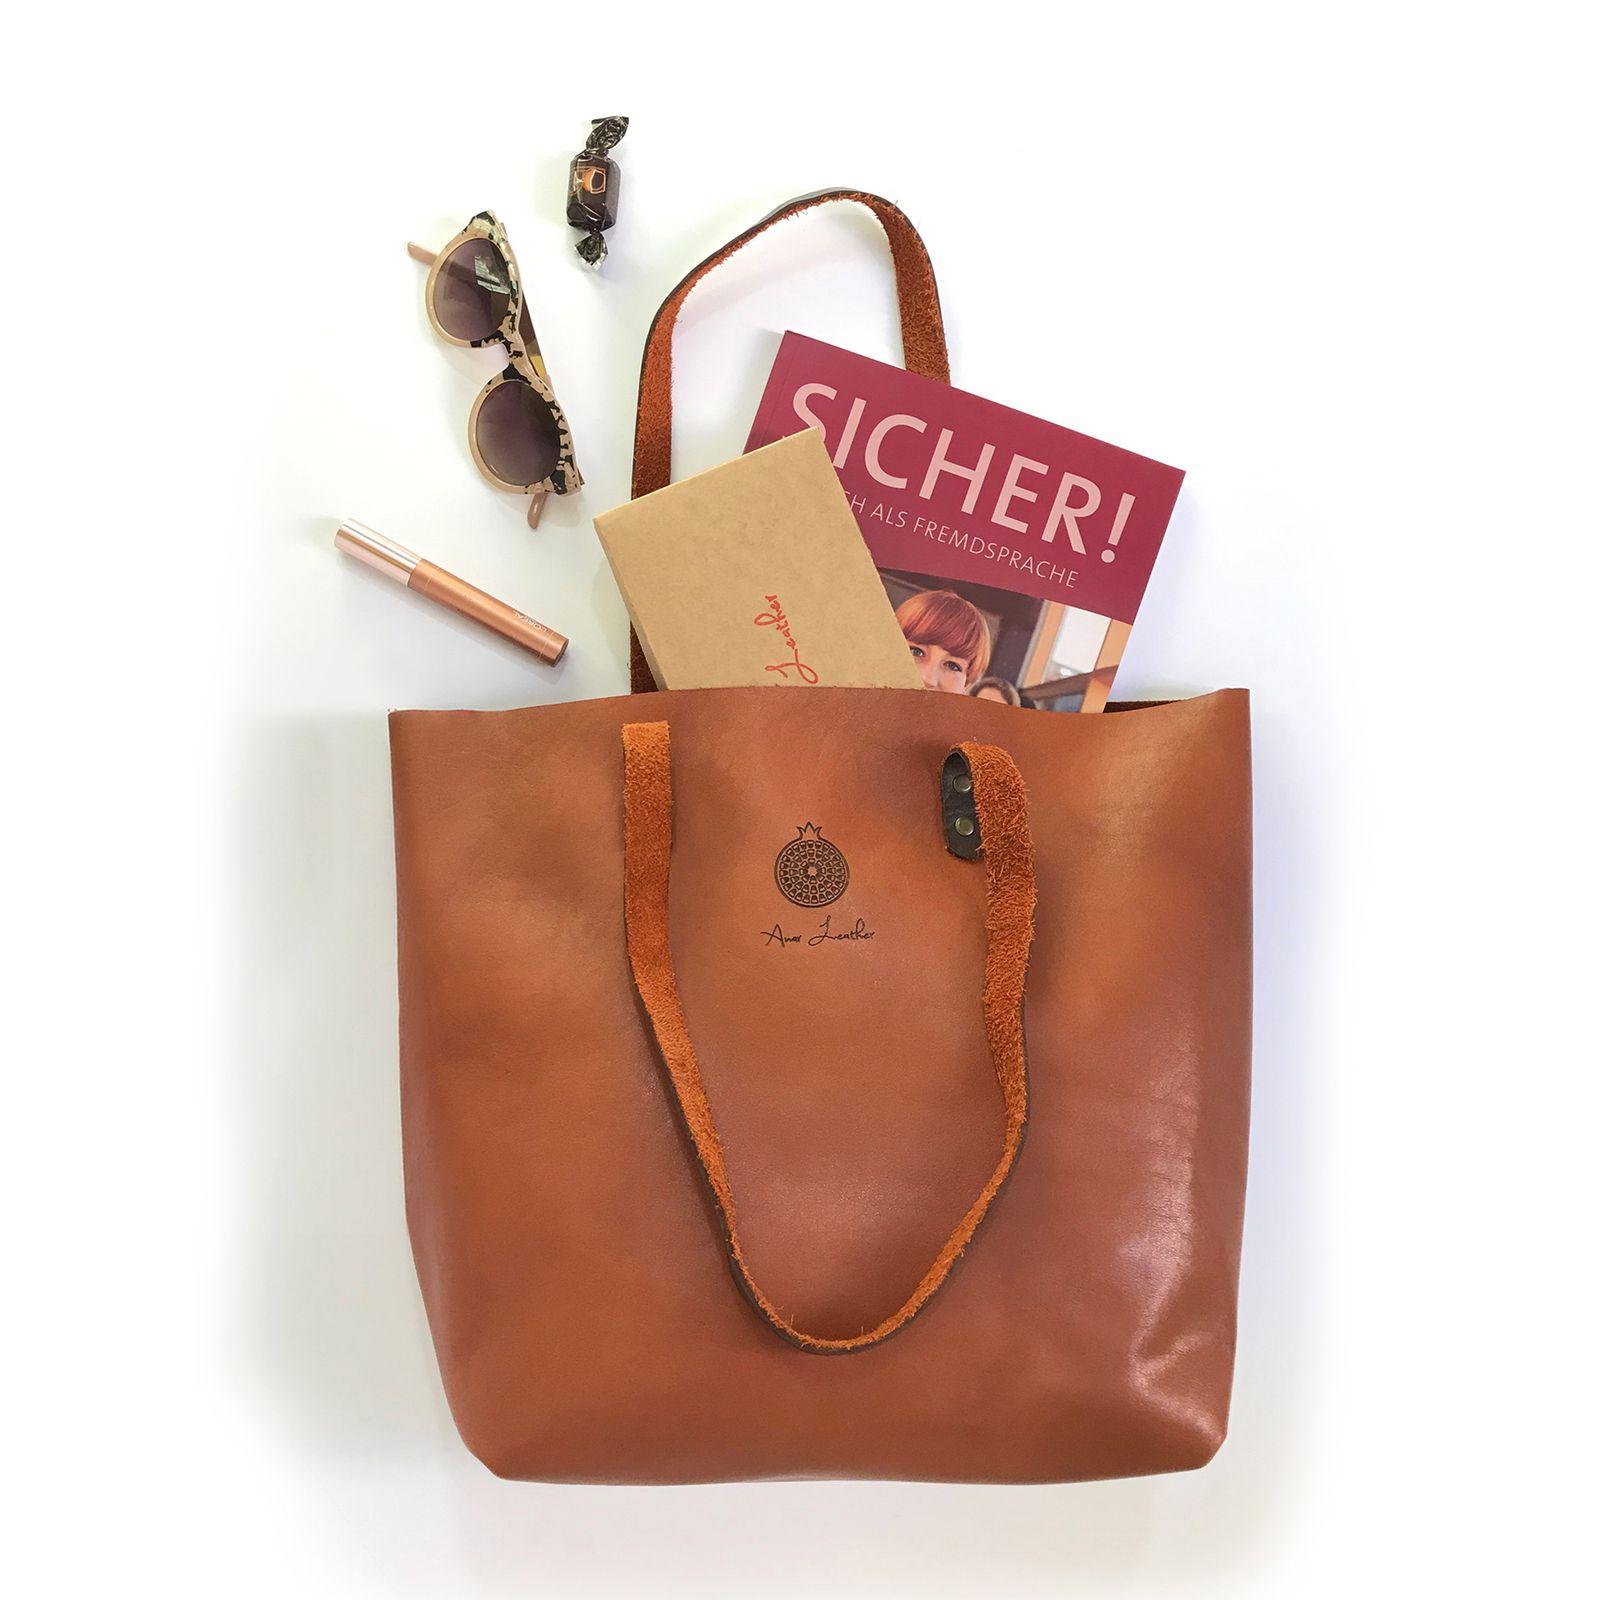 کیف دوشی زنانه انار لدر مدل کارینا -  - 13